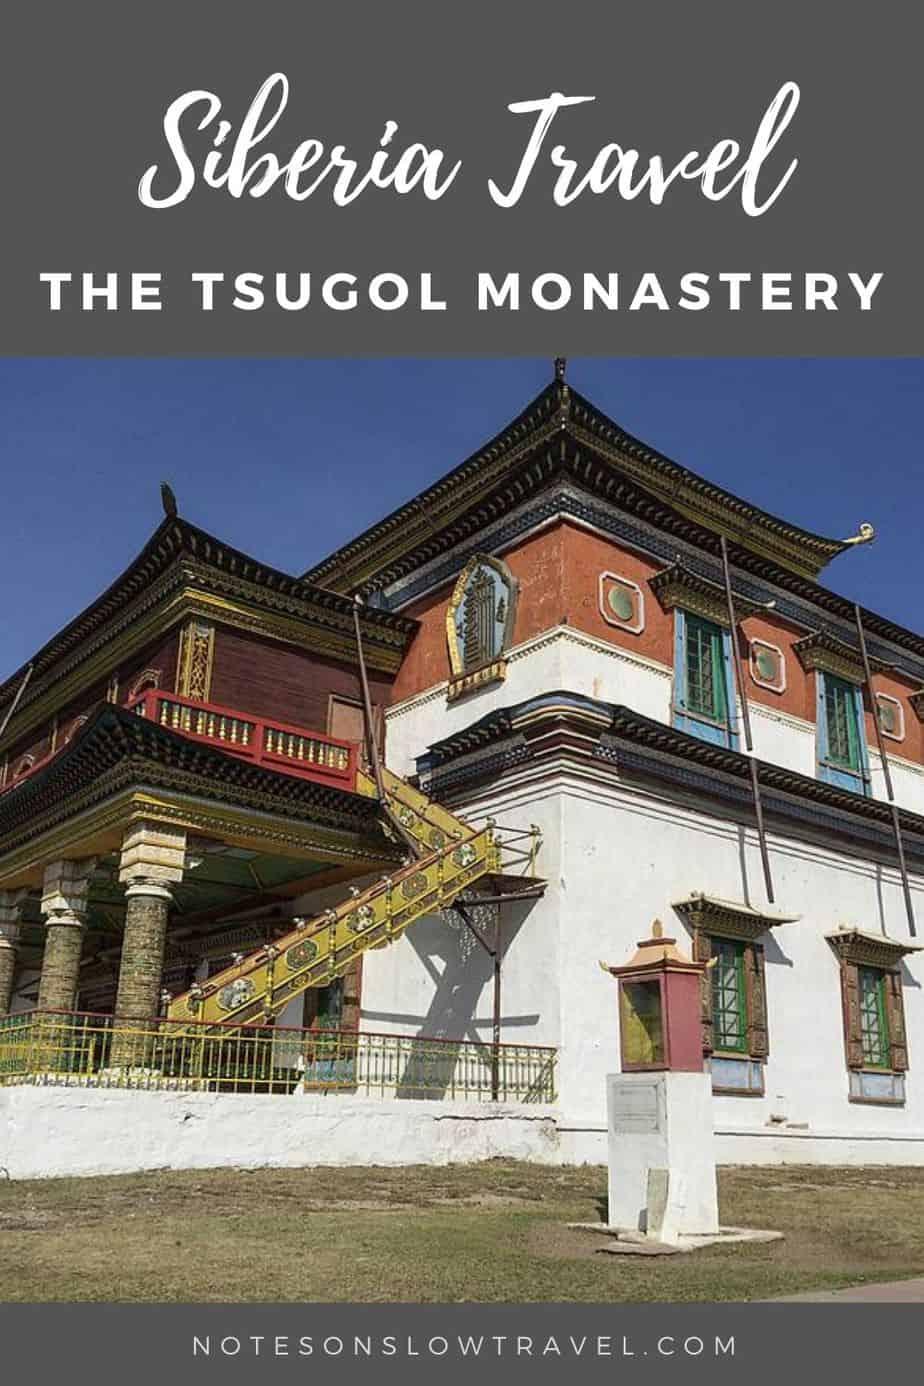 Tsugal Monastery in Russia